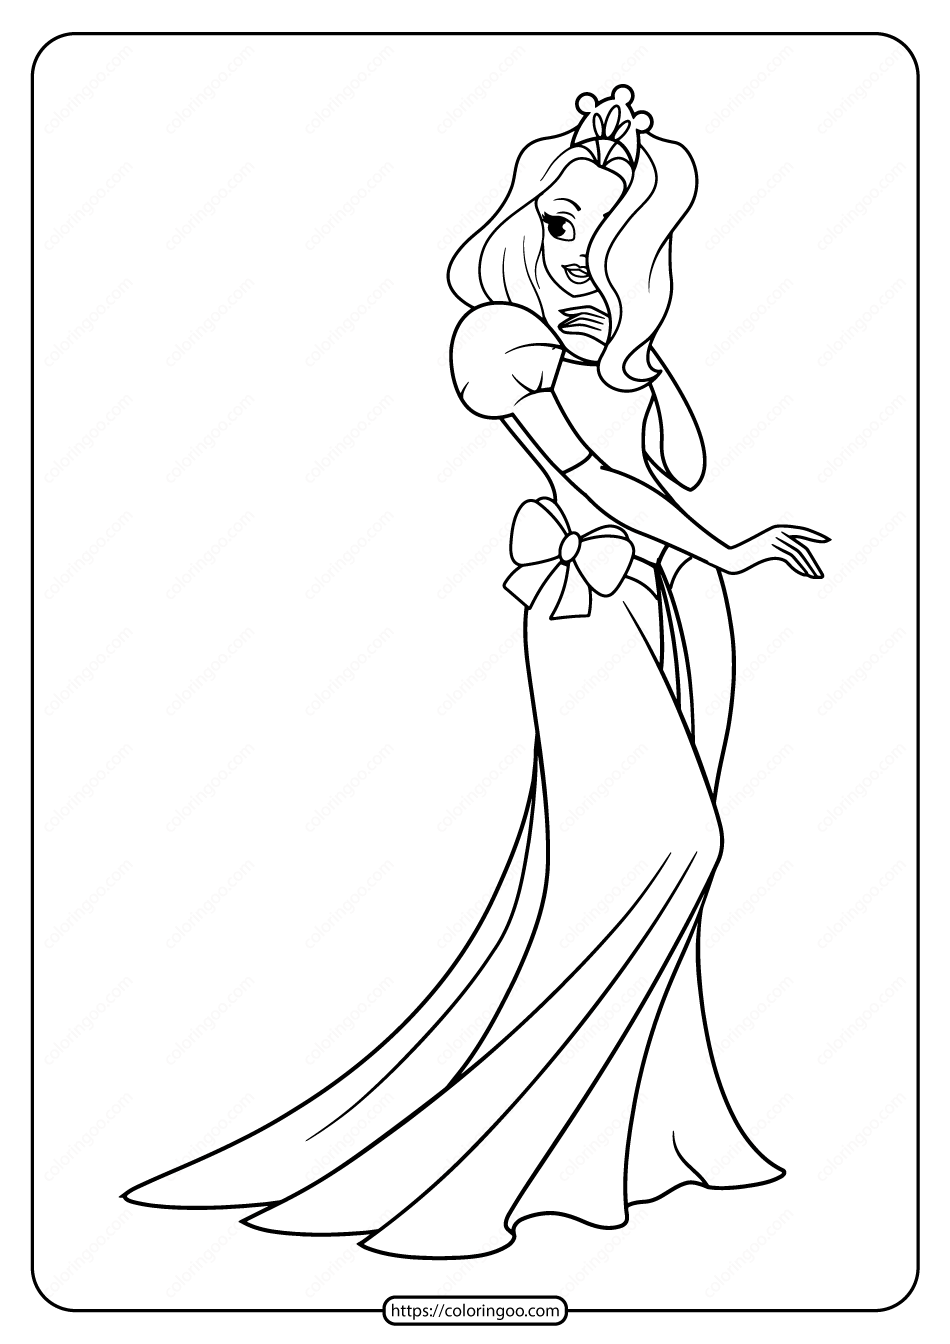 Free Printable Princess Pdf Coloring Pages 02